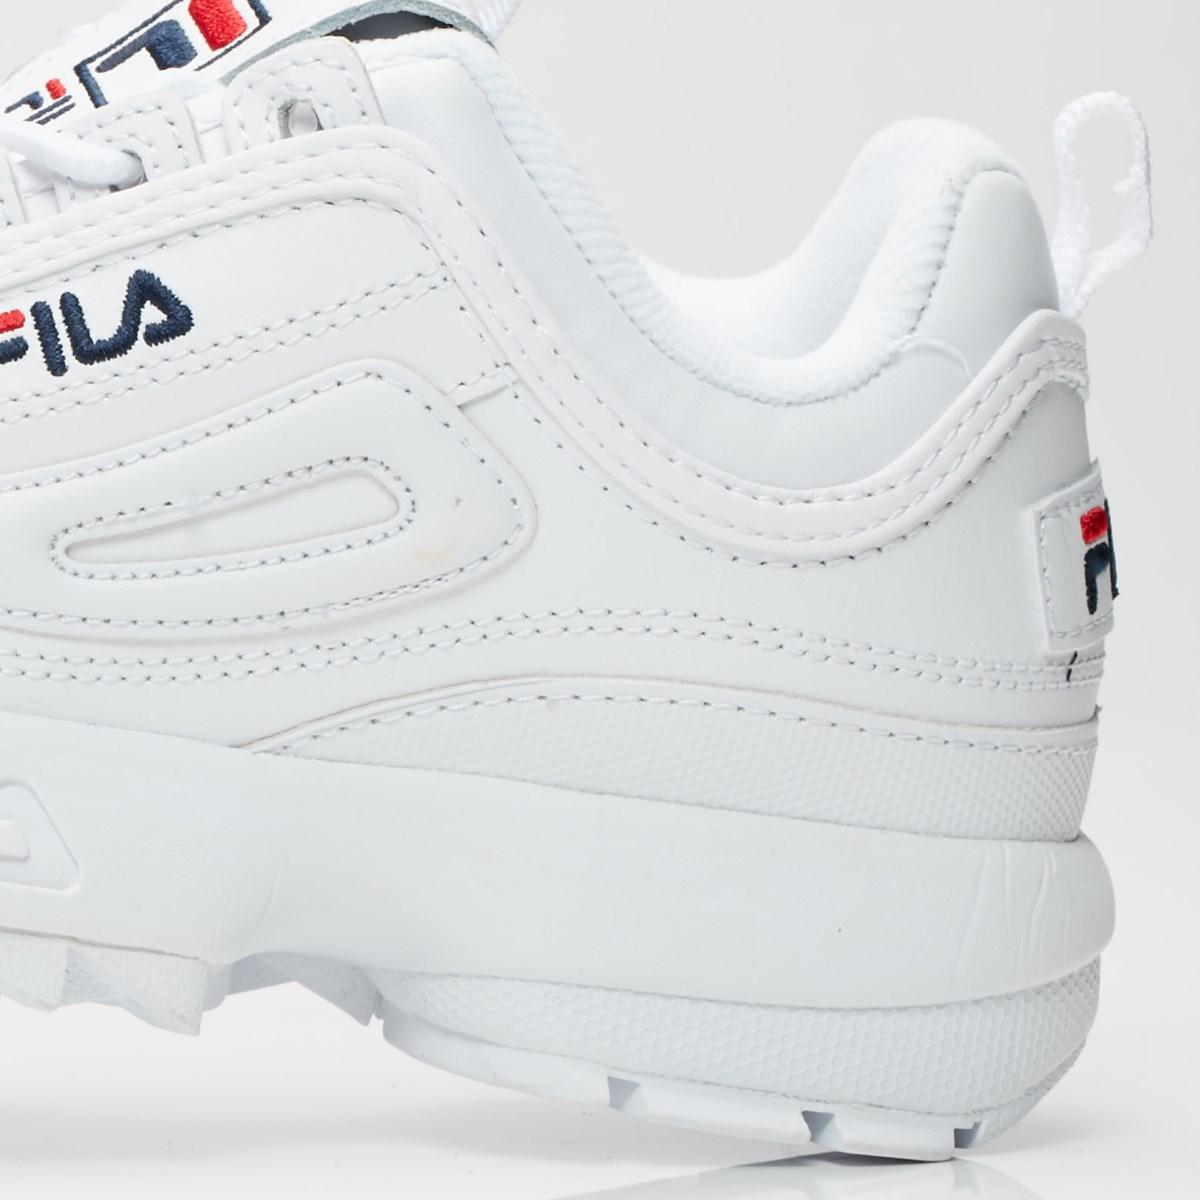 Fila Disruptor II Premium 5fm00002 125 Sneakersnstuff | 1999年創業のスニーカーとストリートウェアのオンラインショップ